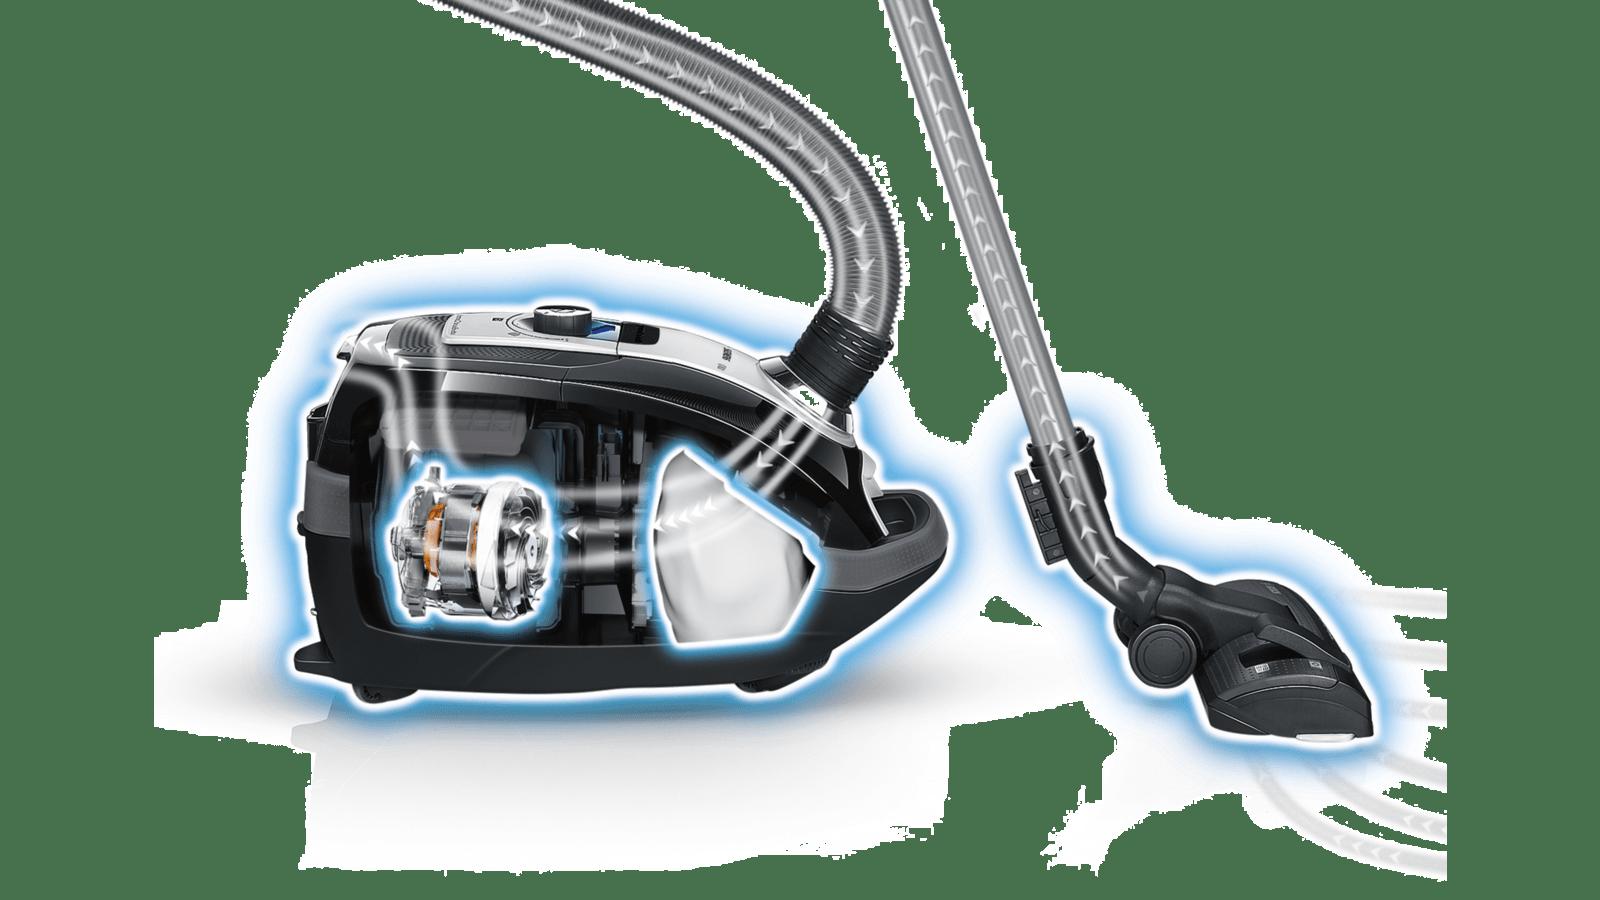 SIEMENS VSQ8ALL1 Bagged vacuum cleaner